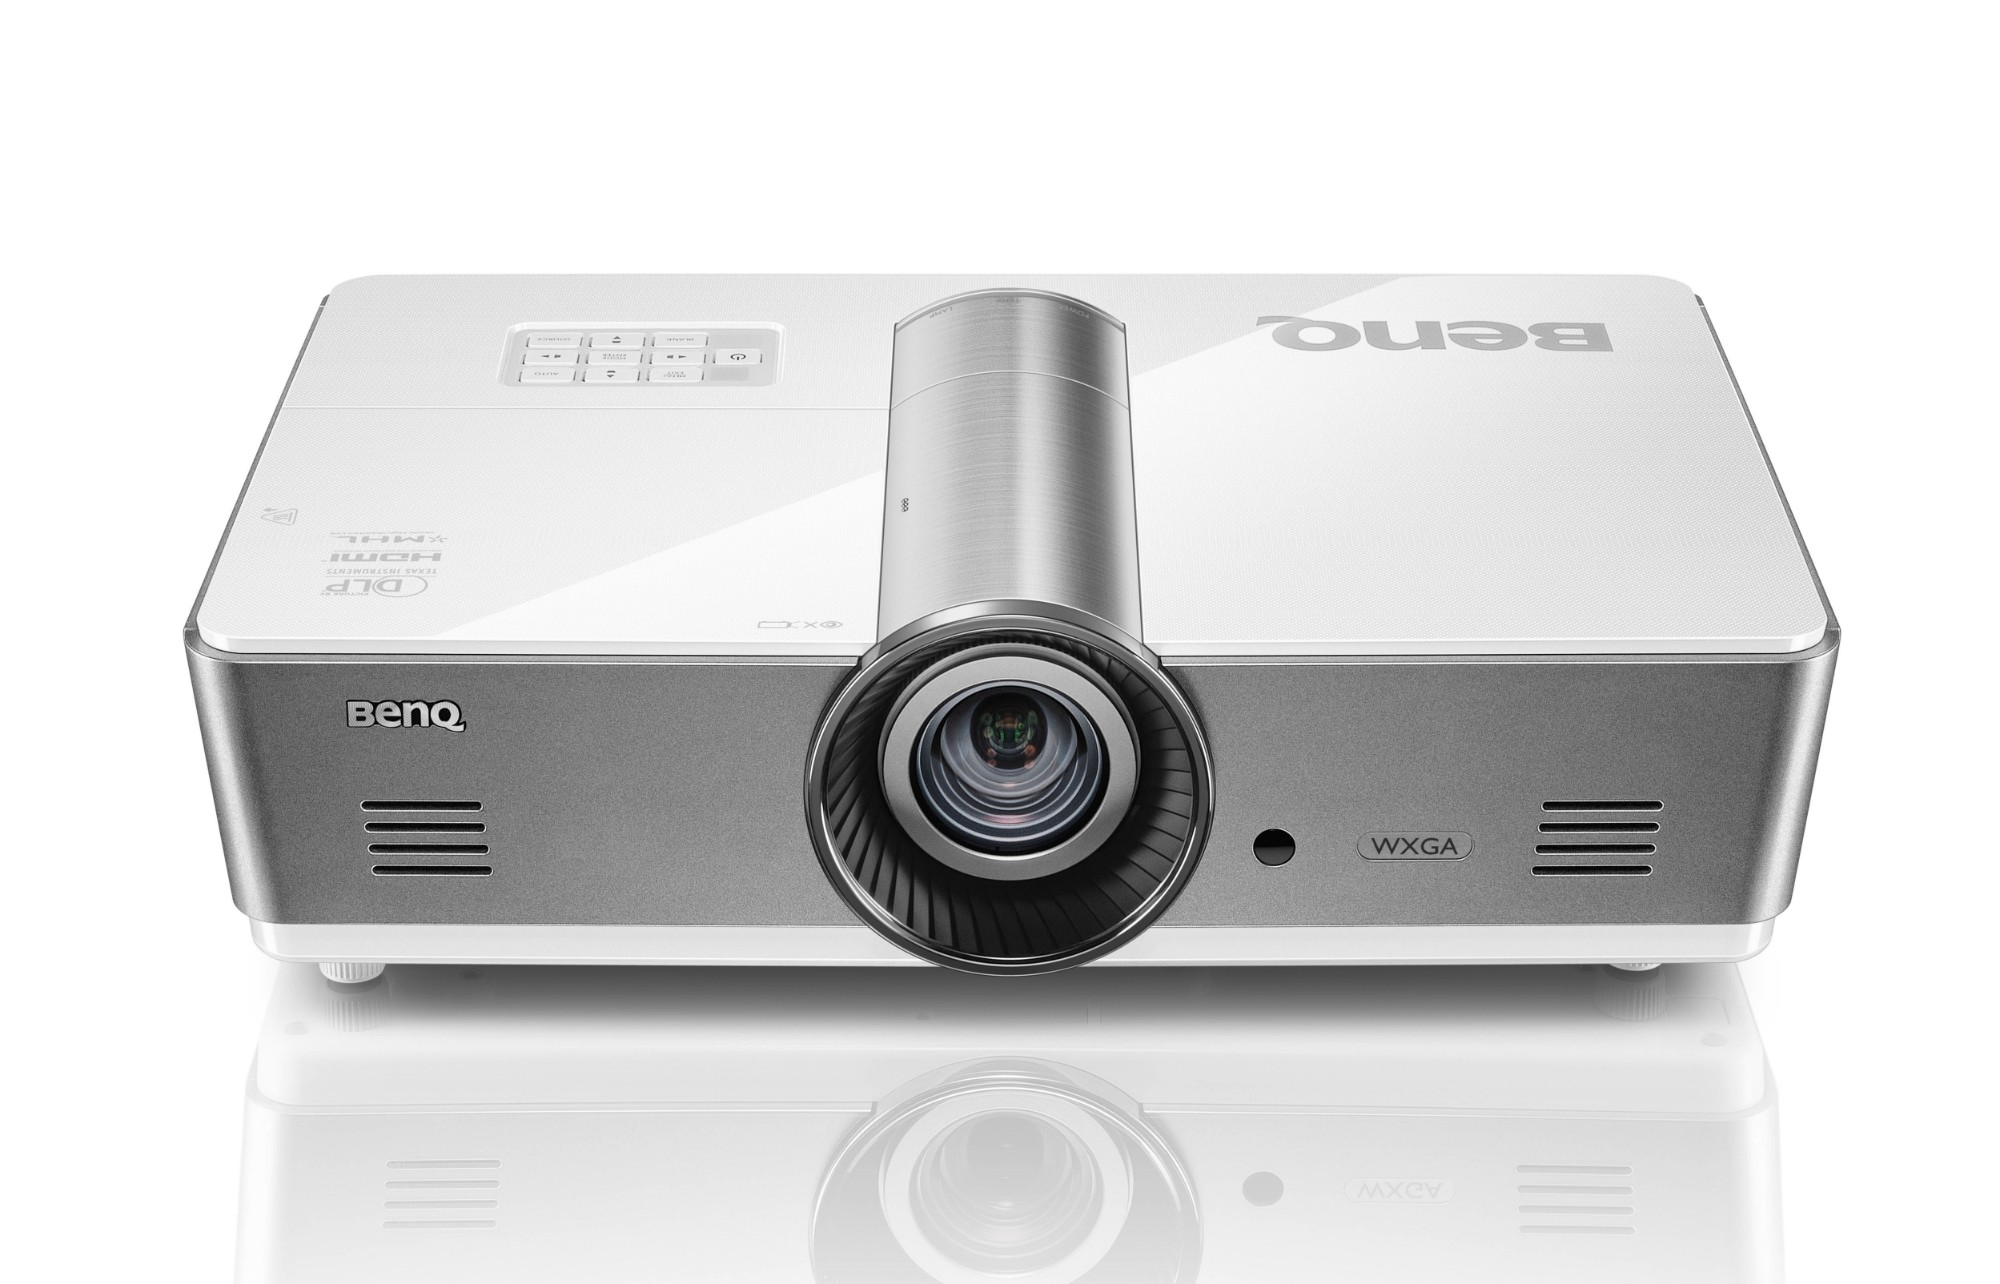 Benq SW921 Desktop projector 5000ANSI lumens LCD WXGA (1280x800) 3D Silver, White data projector